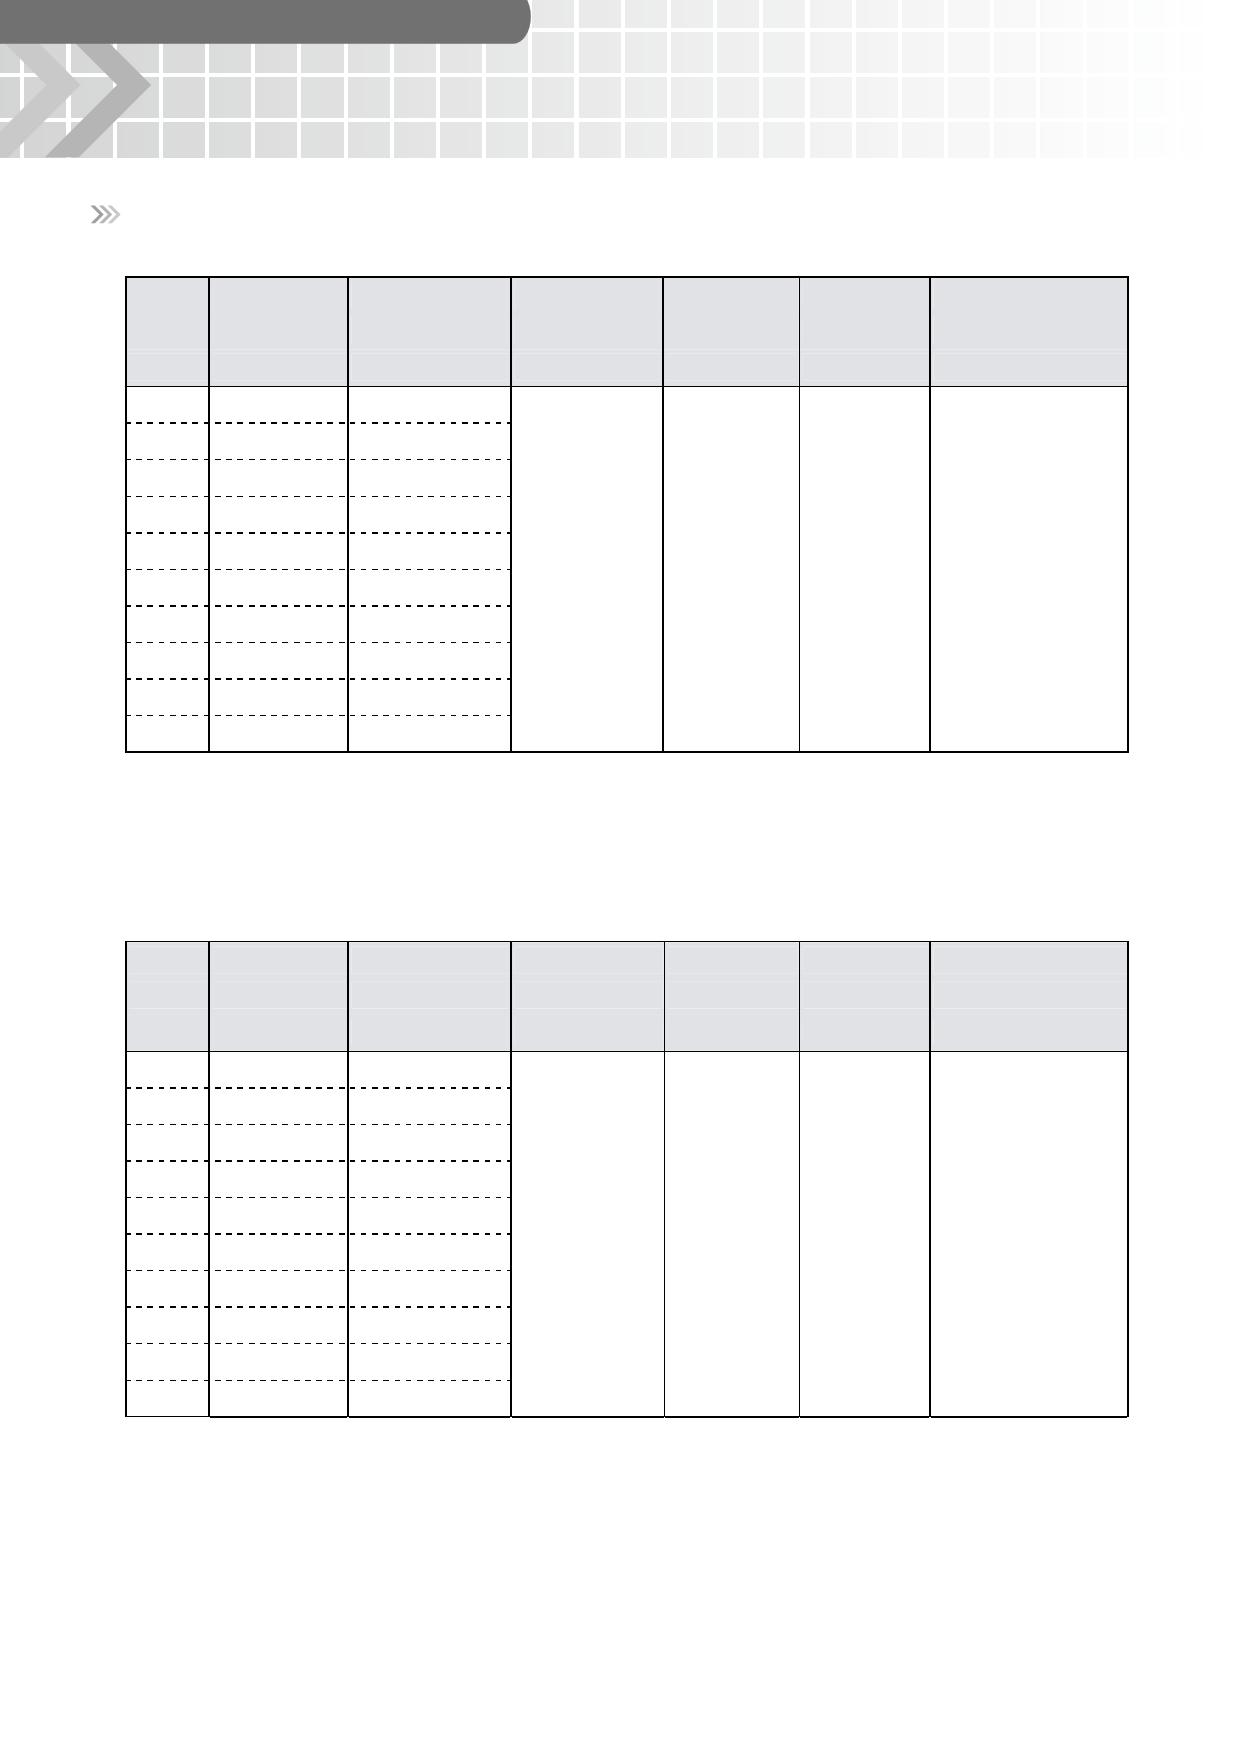 894-2ACA1-F-V pdf, ピン配列